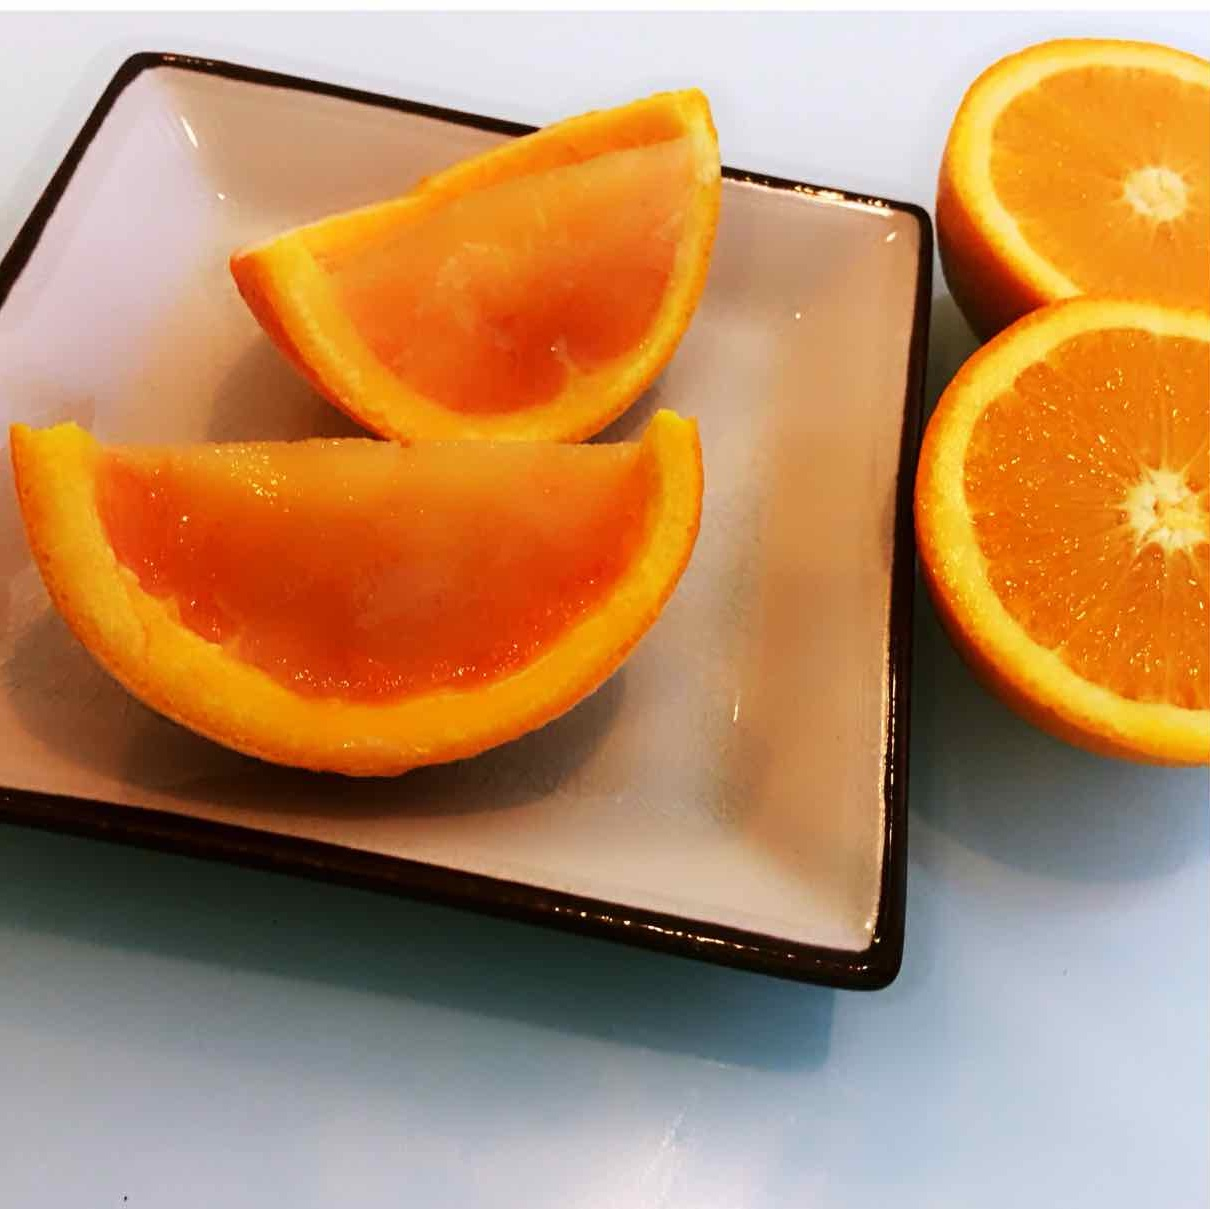 How to make orange Jelly